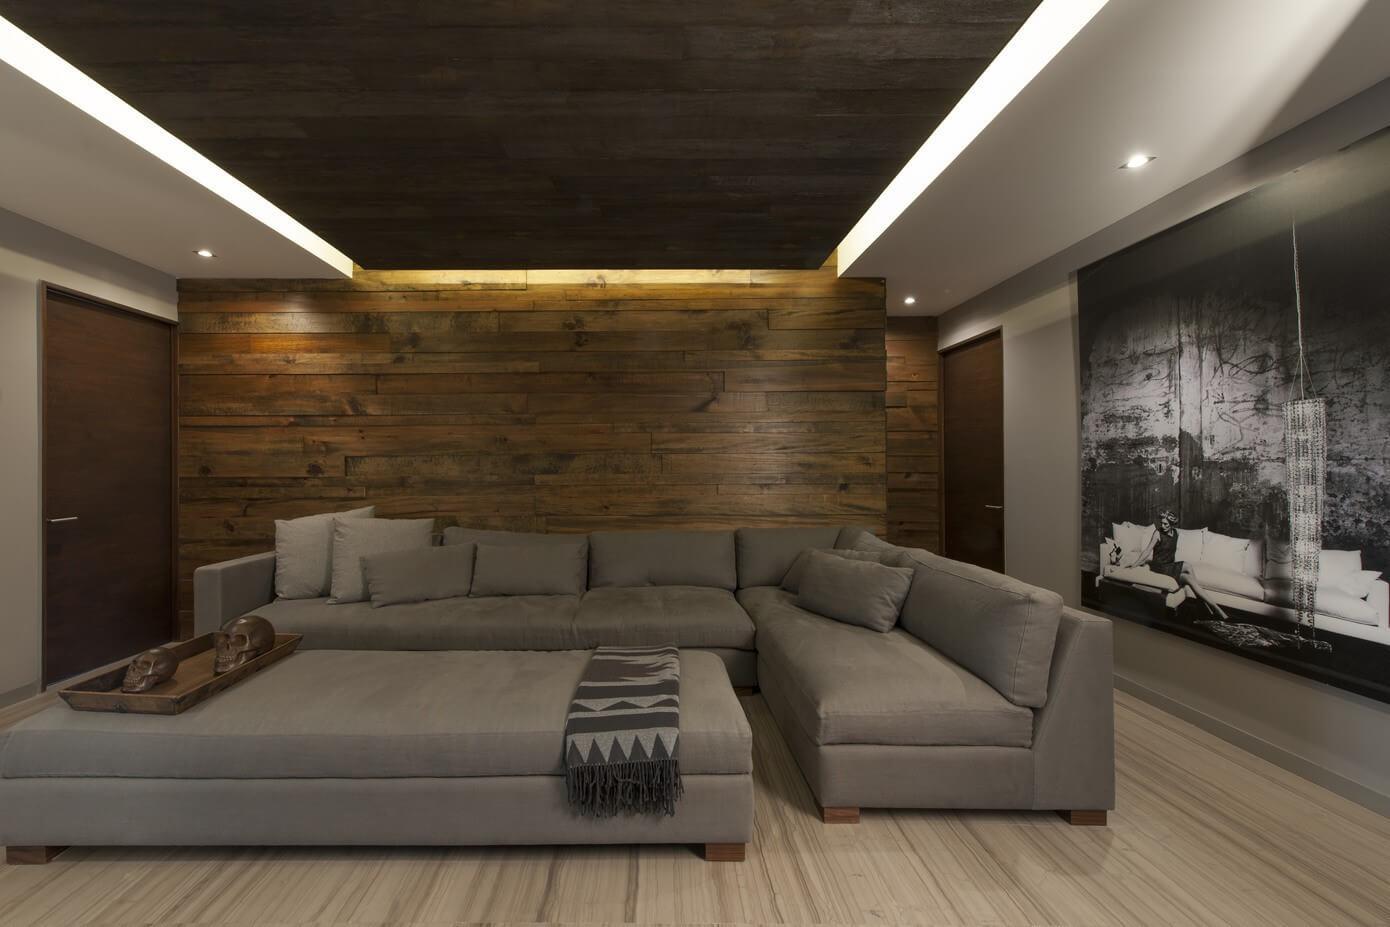 Apartment cm by kababie arquitectos homeadore - Cm arquitectos ...